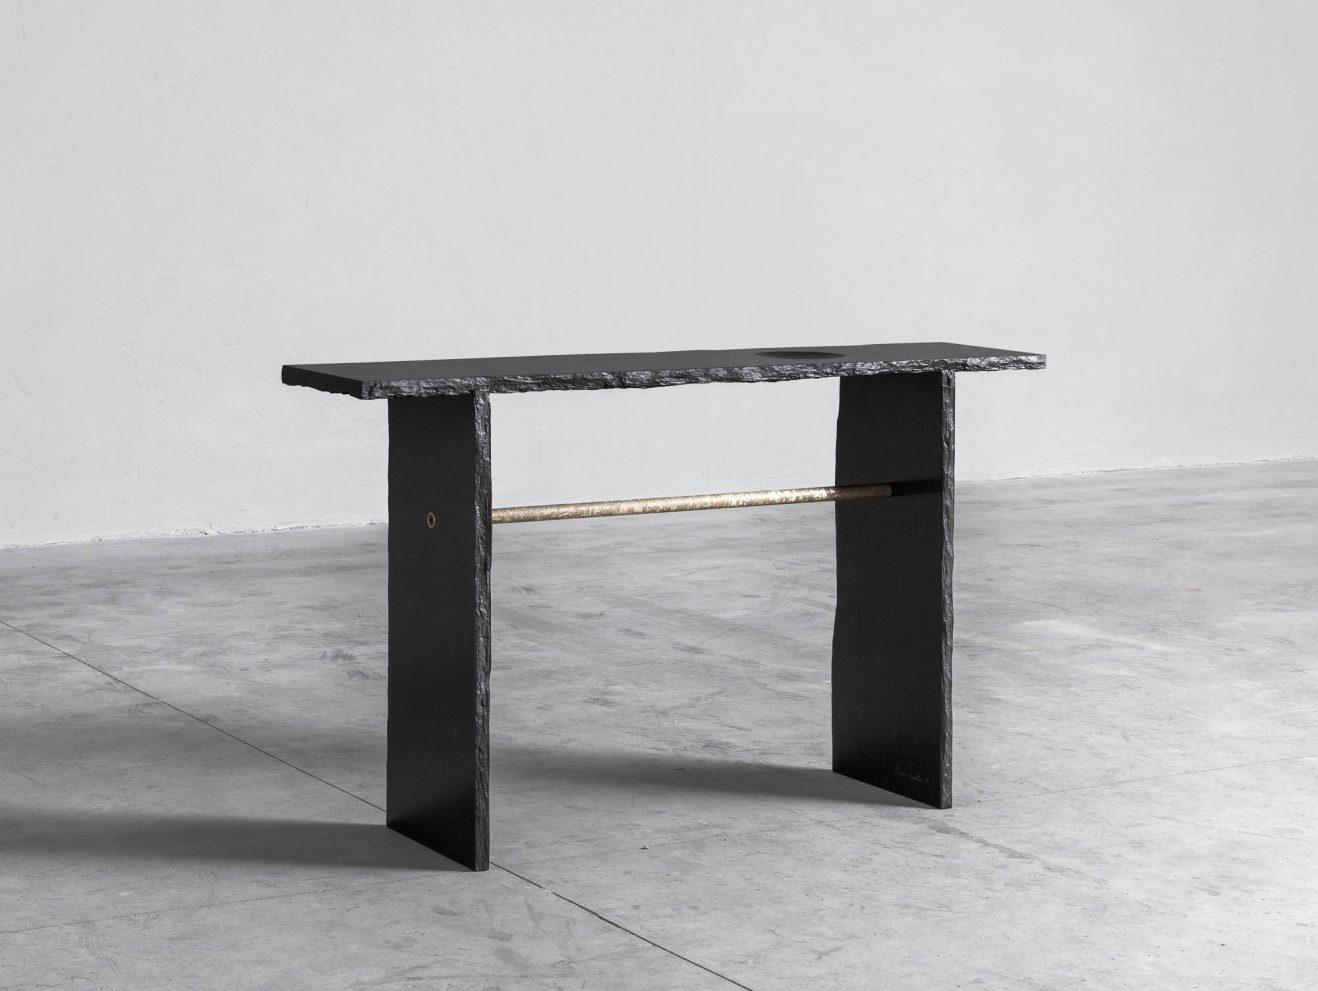 Frederic-Saulou-Console-Intègre-Savannah Bay Gallery-7